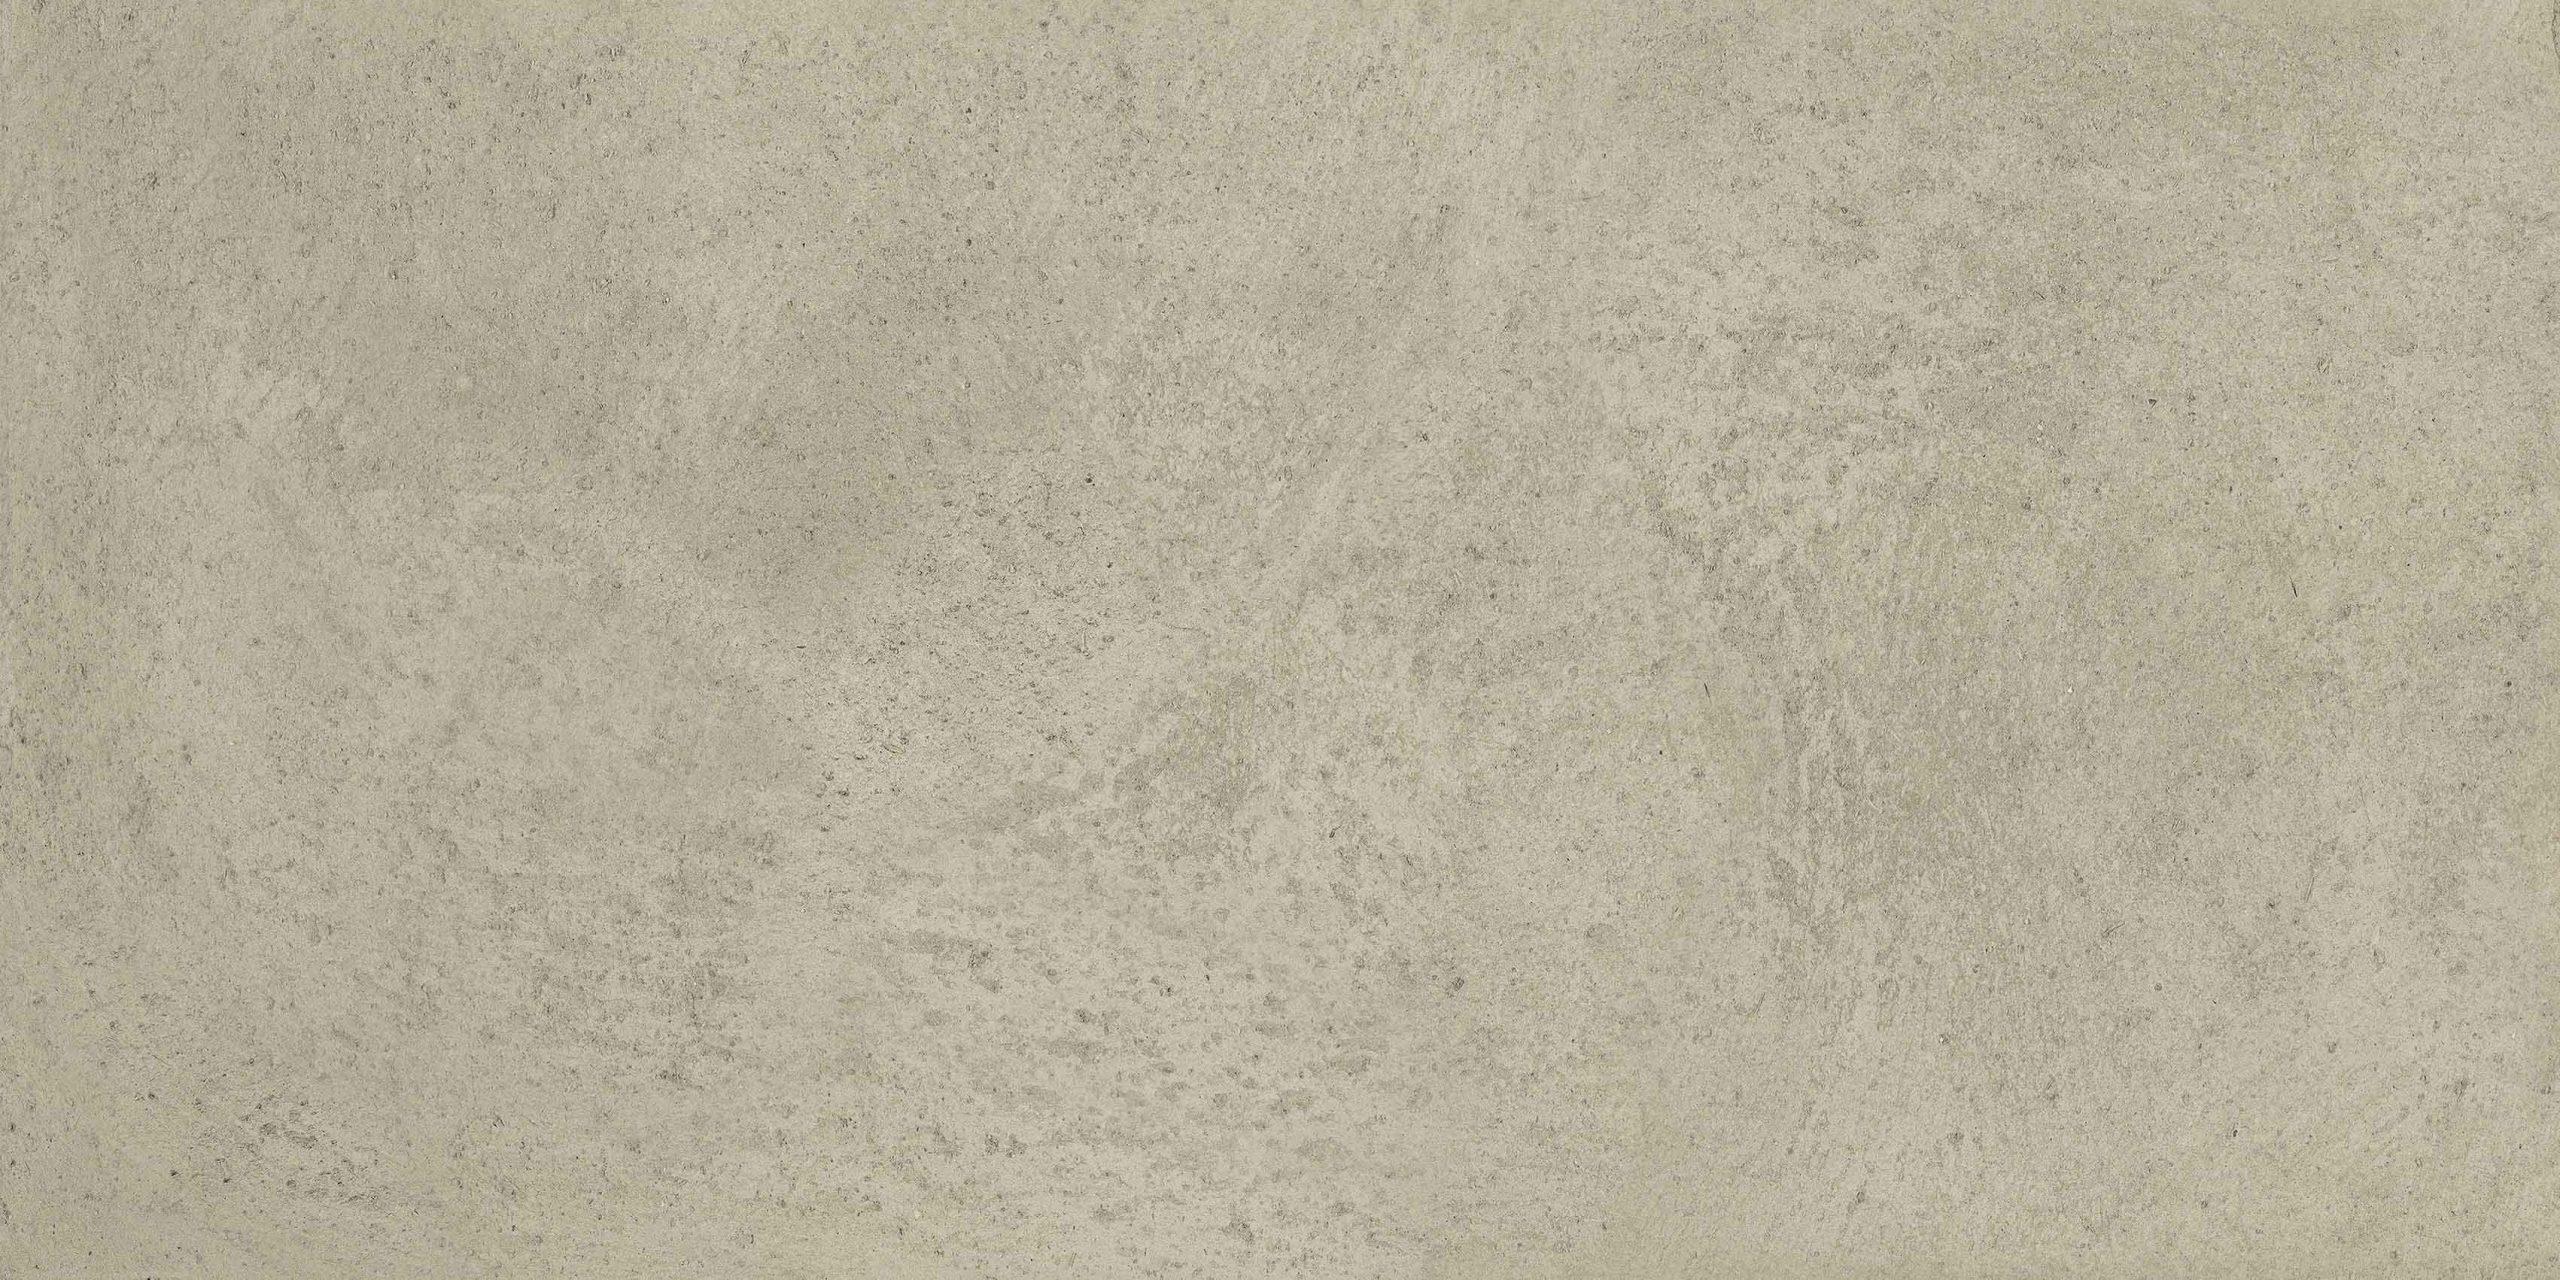 Maps of Cerim Beige Matte 10mm 60 x 120